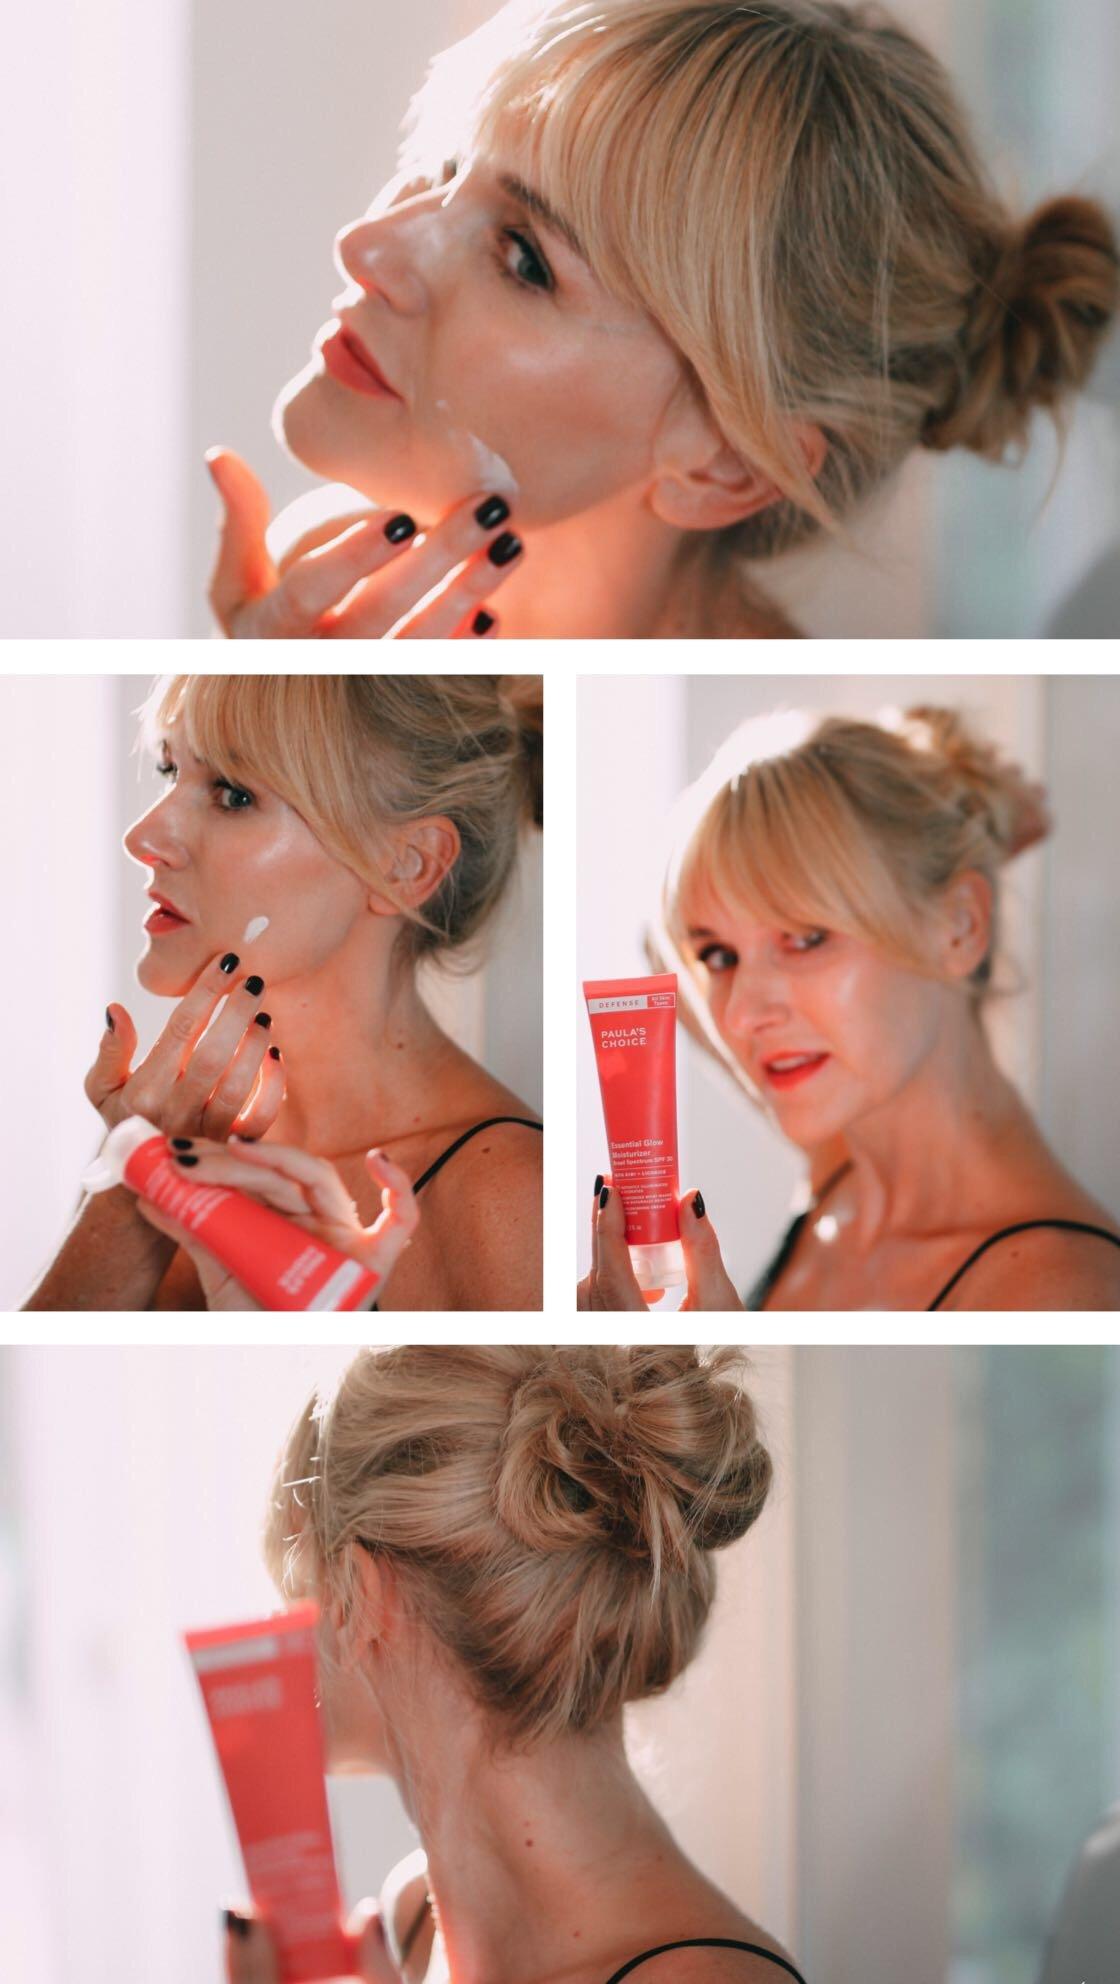 Defense Line von Paula´s Choice - Nowshine Beauty ü40 - my life, my city, my skin Kampagne